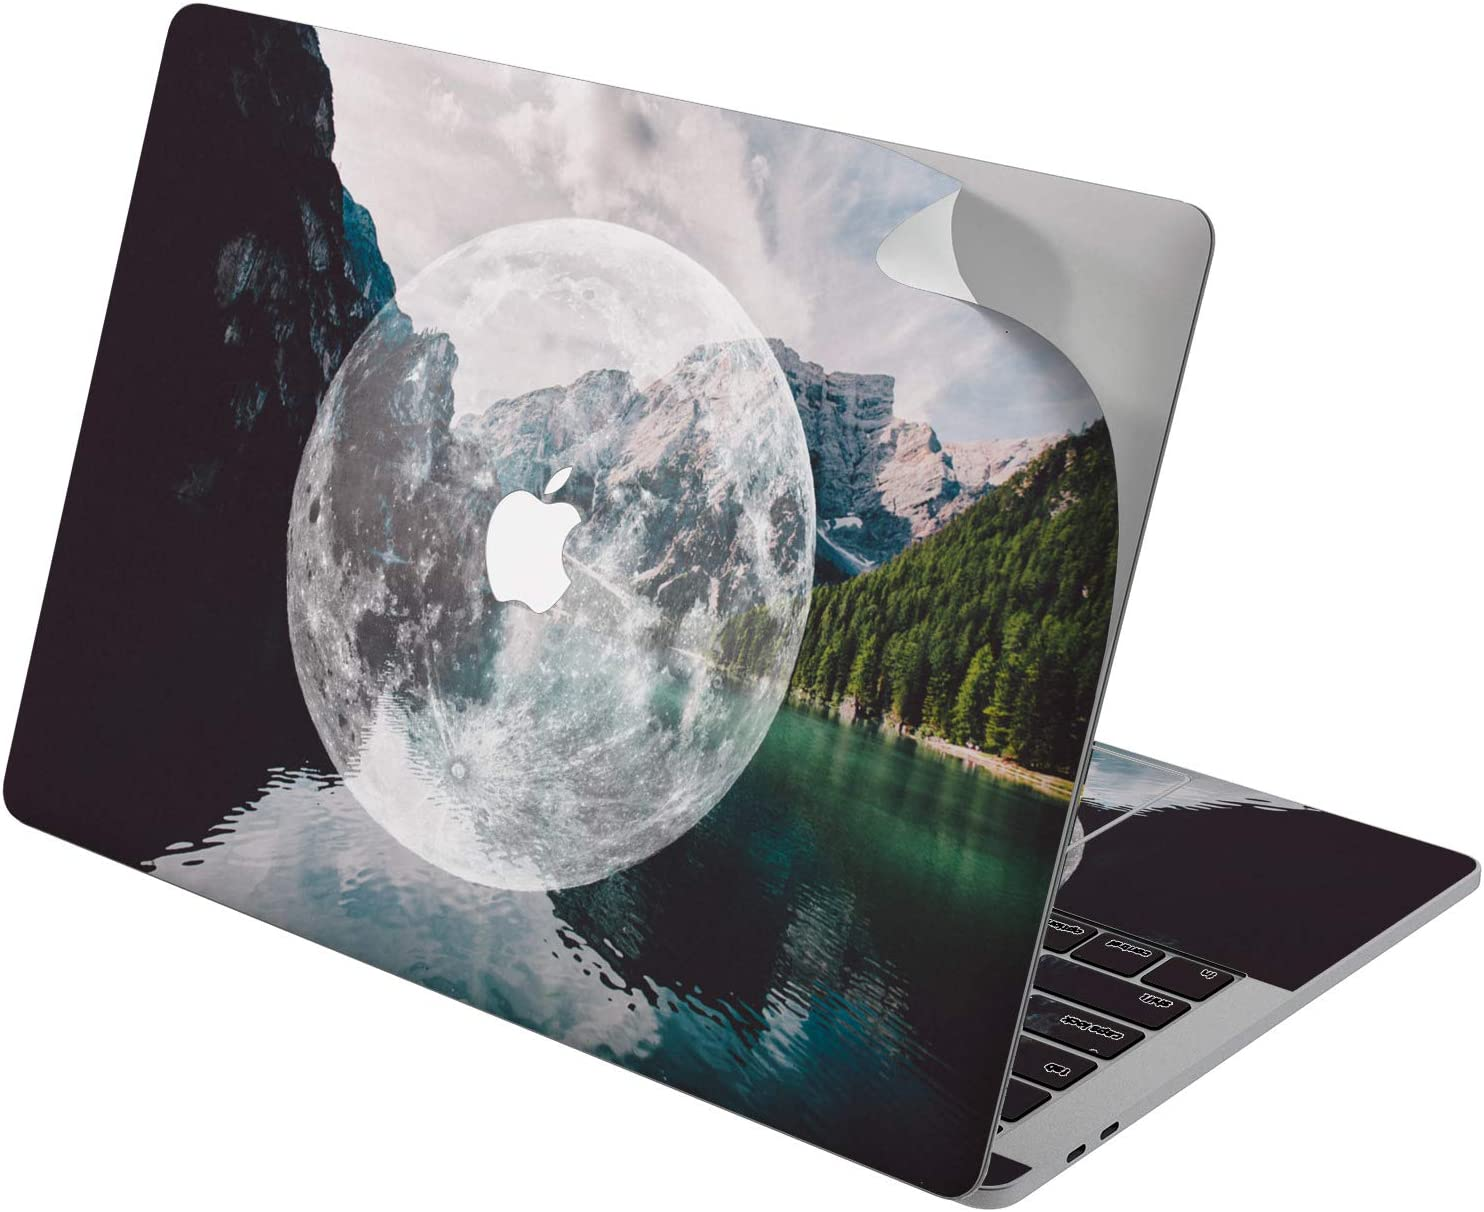 "Cavka Vinyl Decal Skin for Apple MacBook Pro 13"" 2019 15"" 2018 Air 13"" 2020 Retina 2015 Mac 11"" Mac 12"" Planet Sticker Moon Laptop Cover Lake Nature Lunar Forest Mountain Protective Nice Print Design"